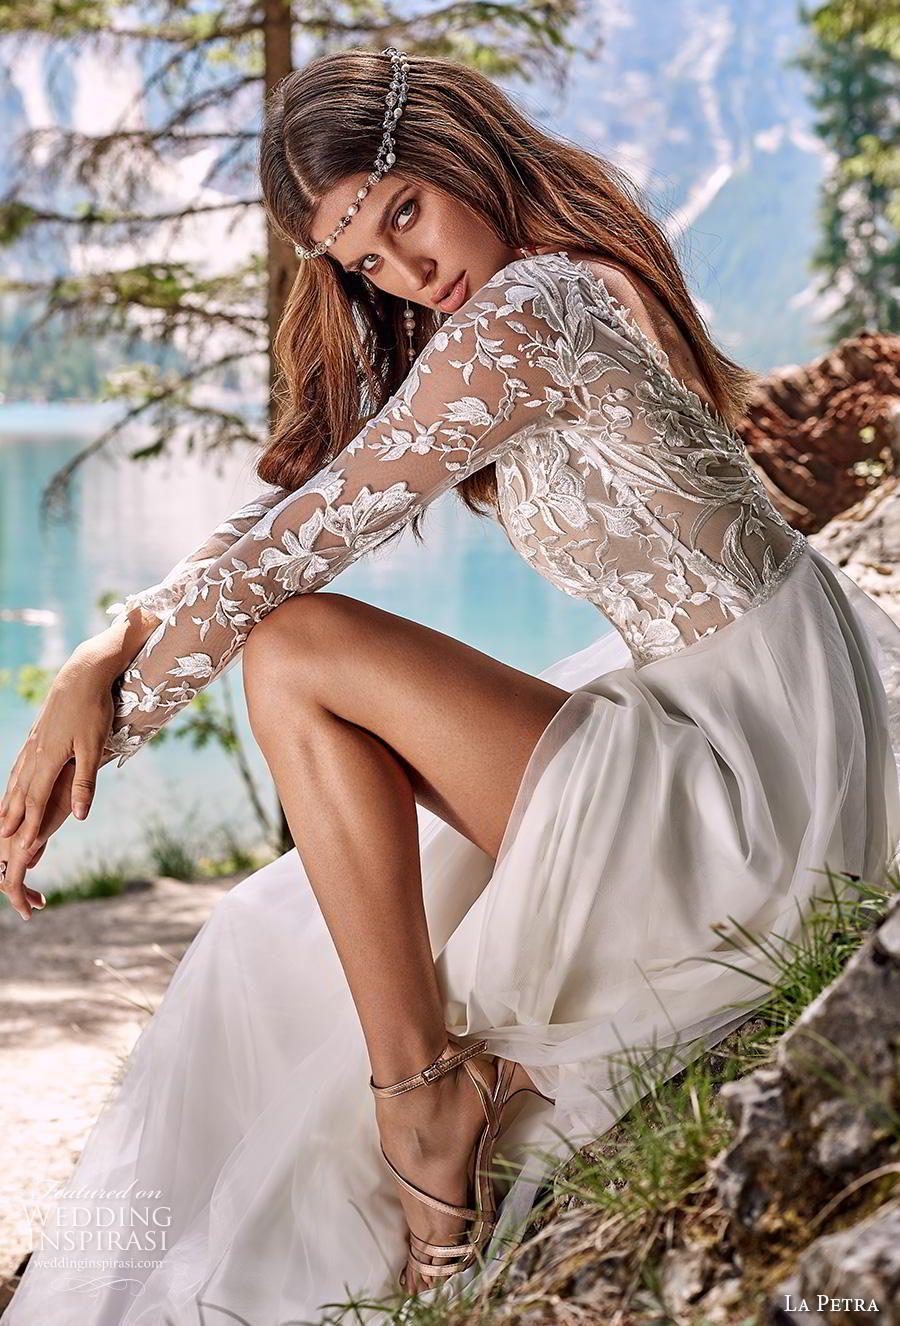 La Petra 2020 Wedding Dresses Aquamarine Bridal Collection Wedding Inspirasi Summer Wedding Dress Wedding Gown Inspiration Chiffon Wedding Dress [ 1326 x 900 Pixel ]